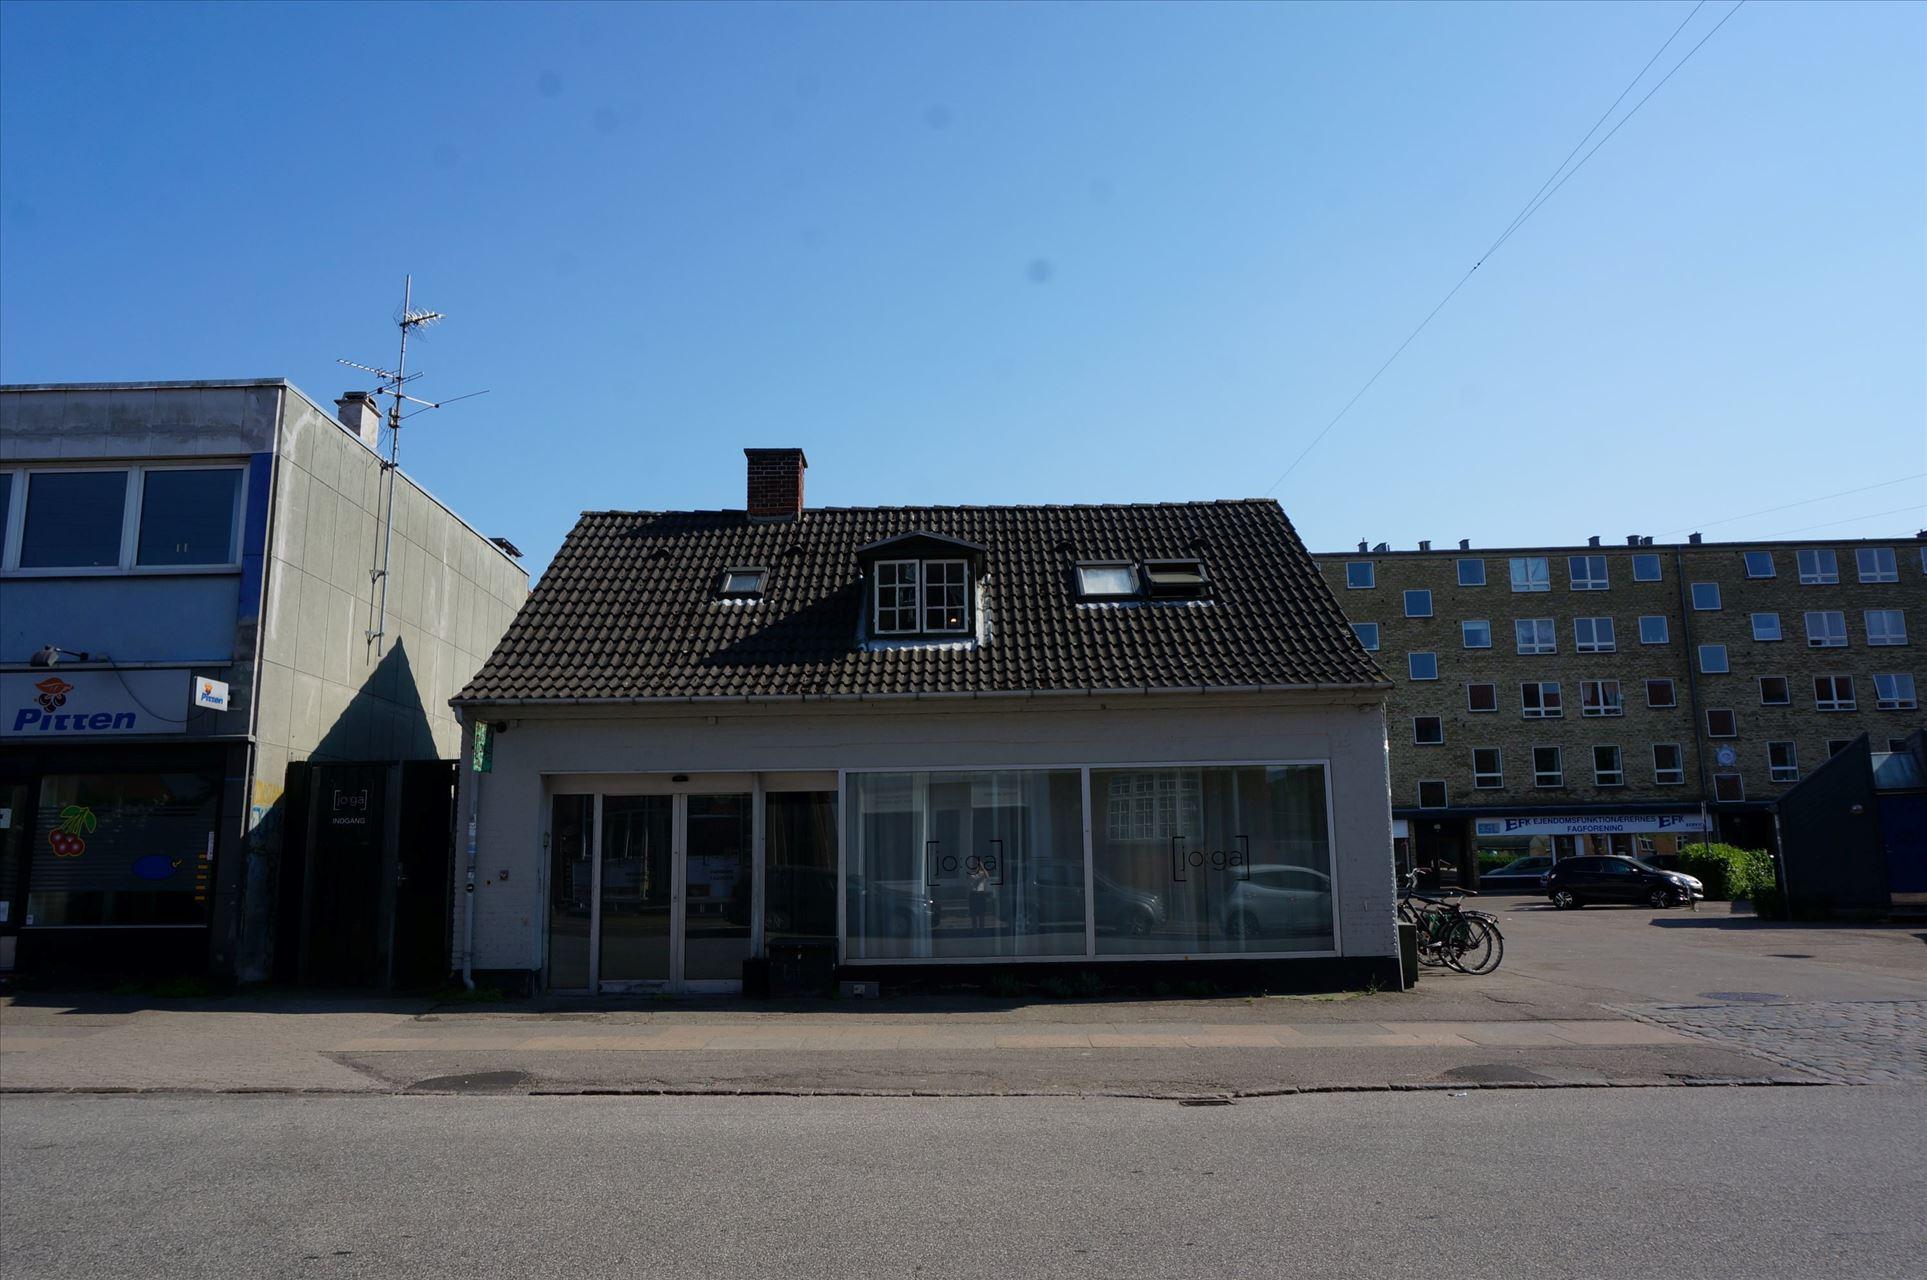 80 m² momsfrit lokale i Vanløse